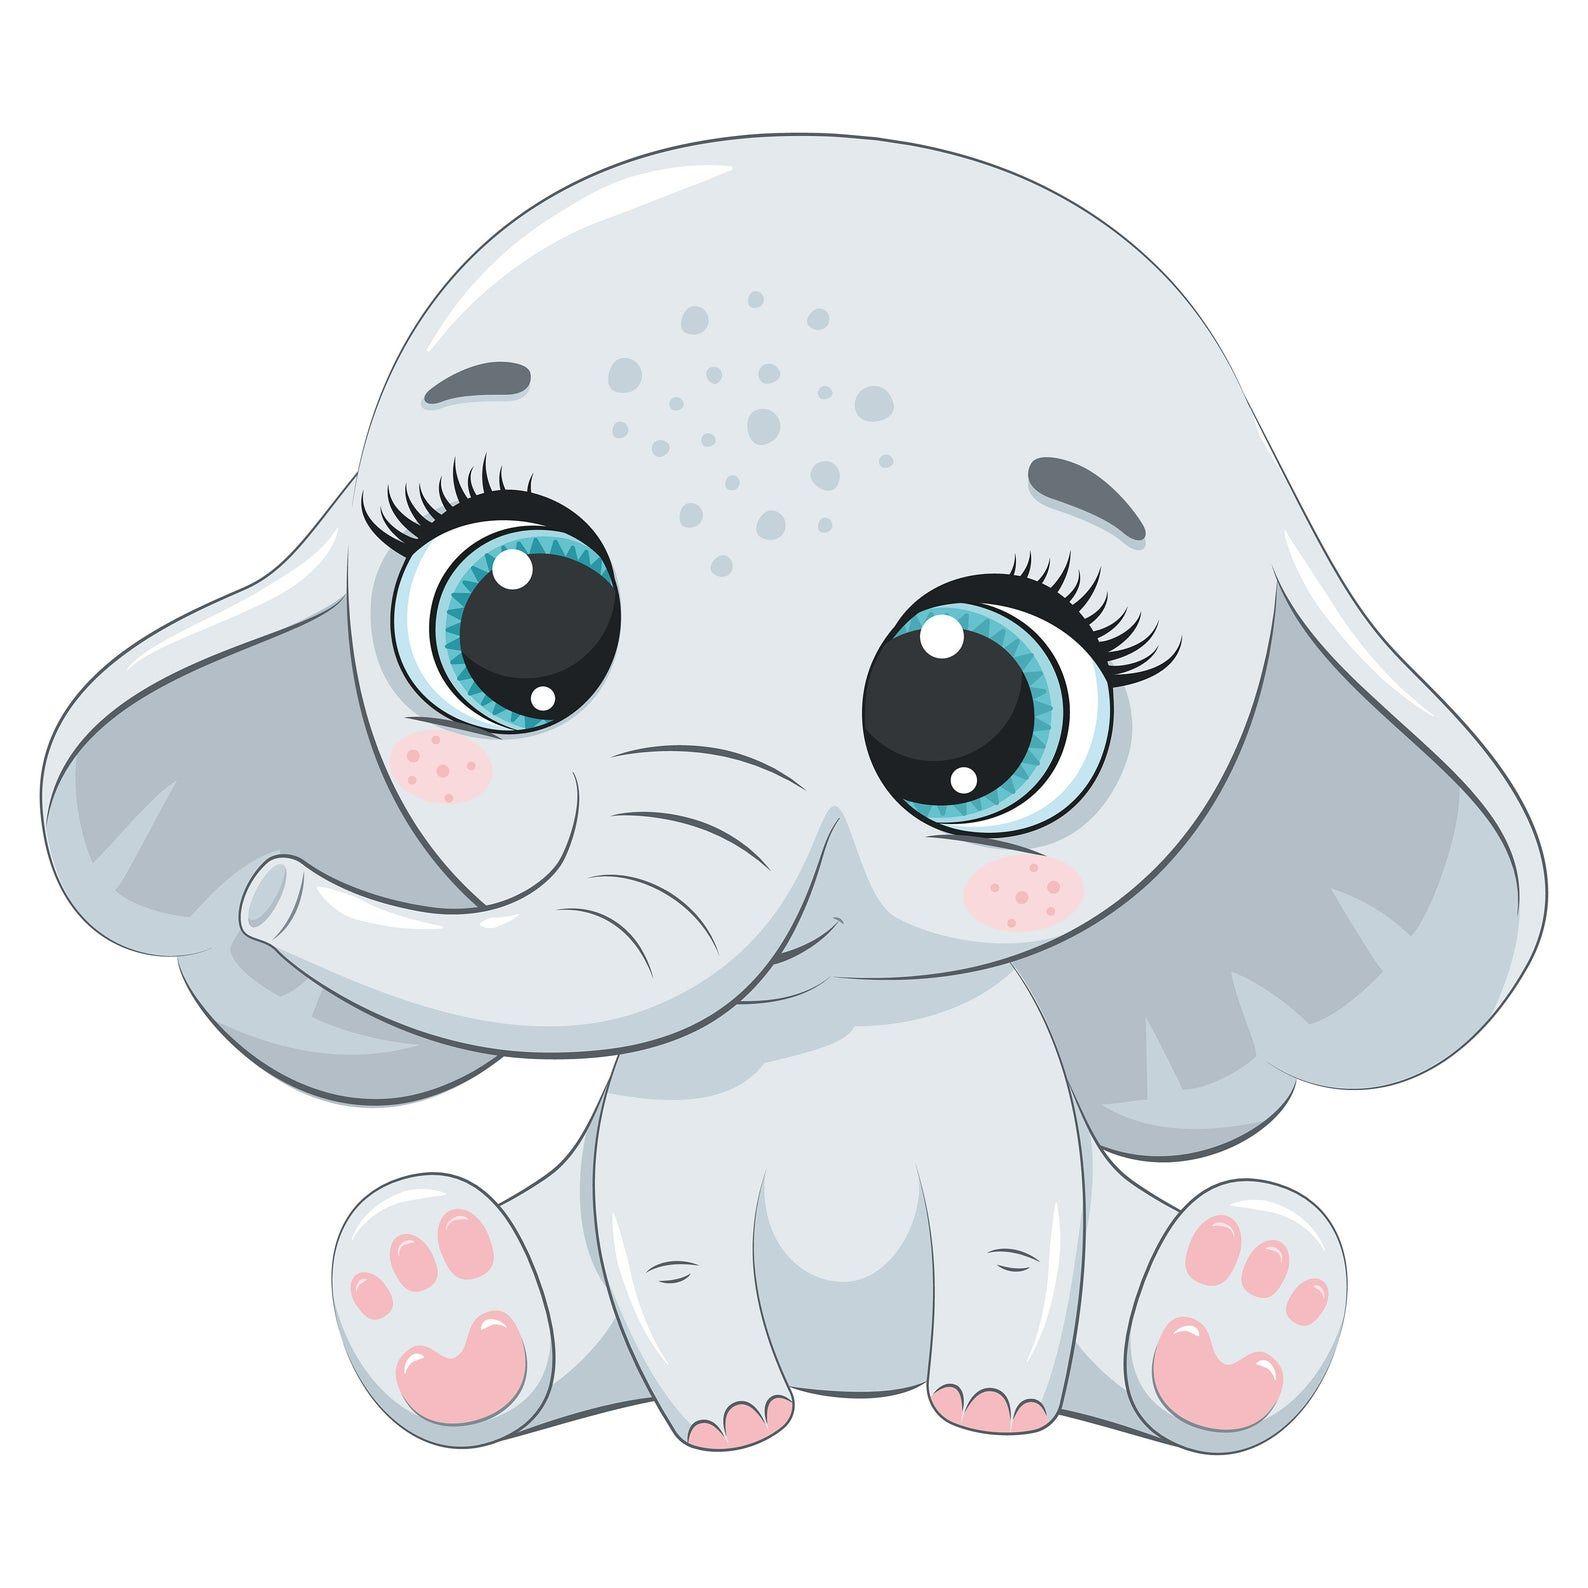 Cute Zoo Animals Clipart Png Eps Australian Animals Clipart Etsy Animal Clipart Baby Animal Drawings Cartoon Baby Animals